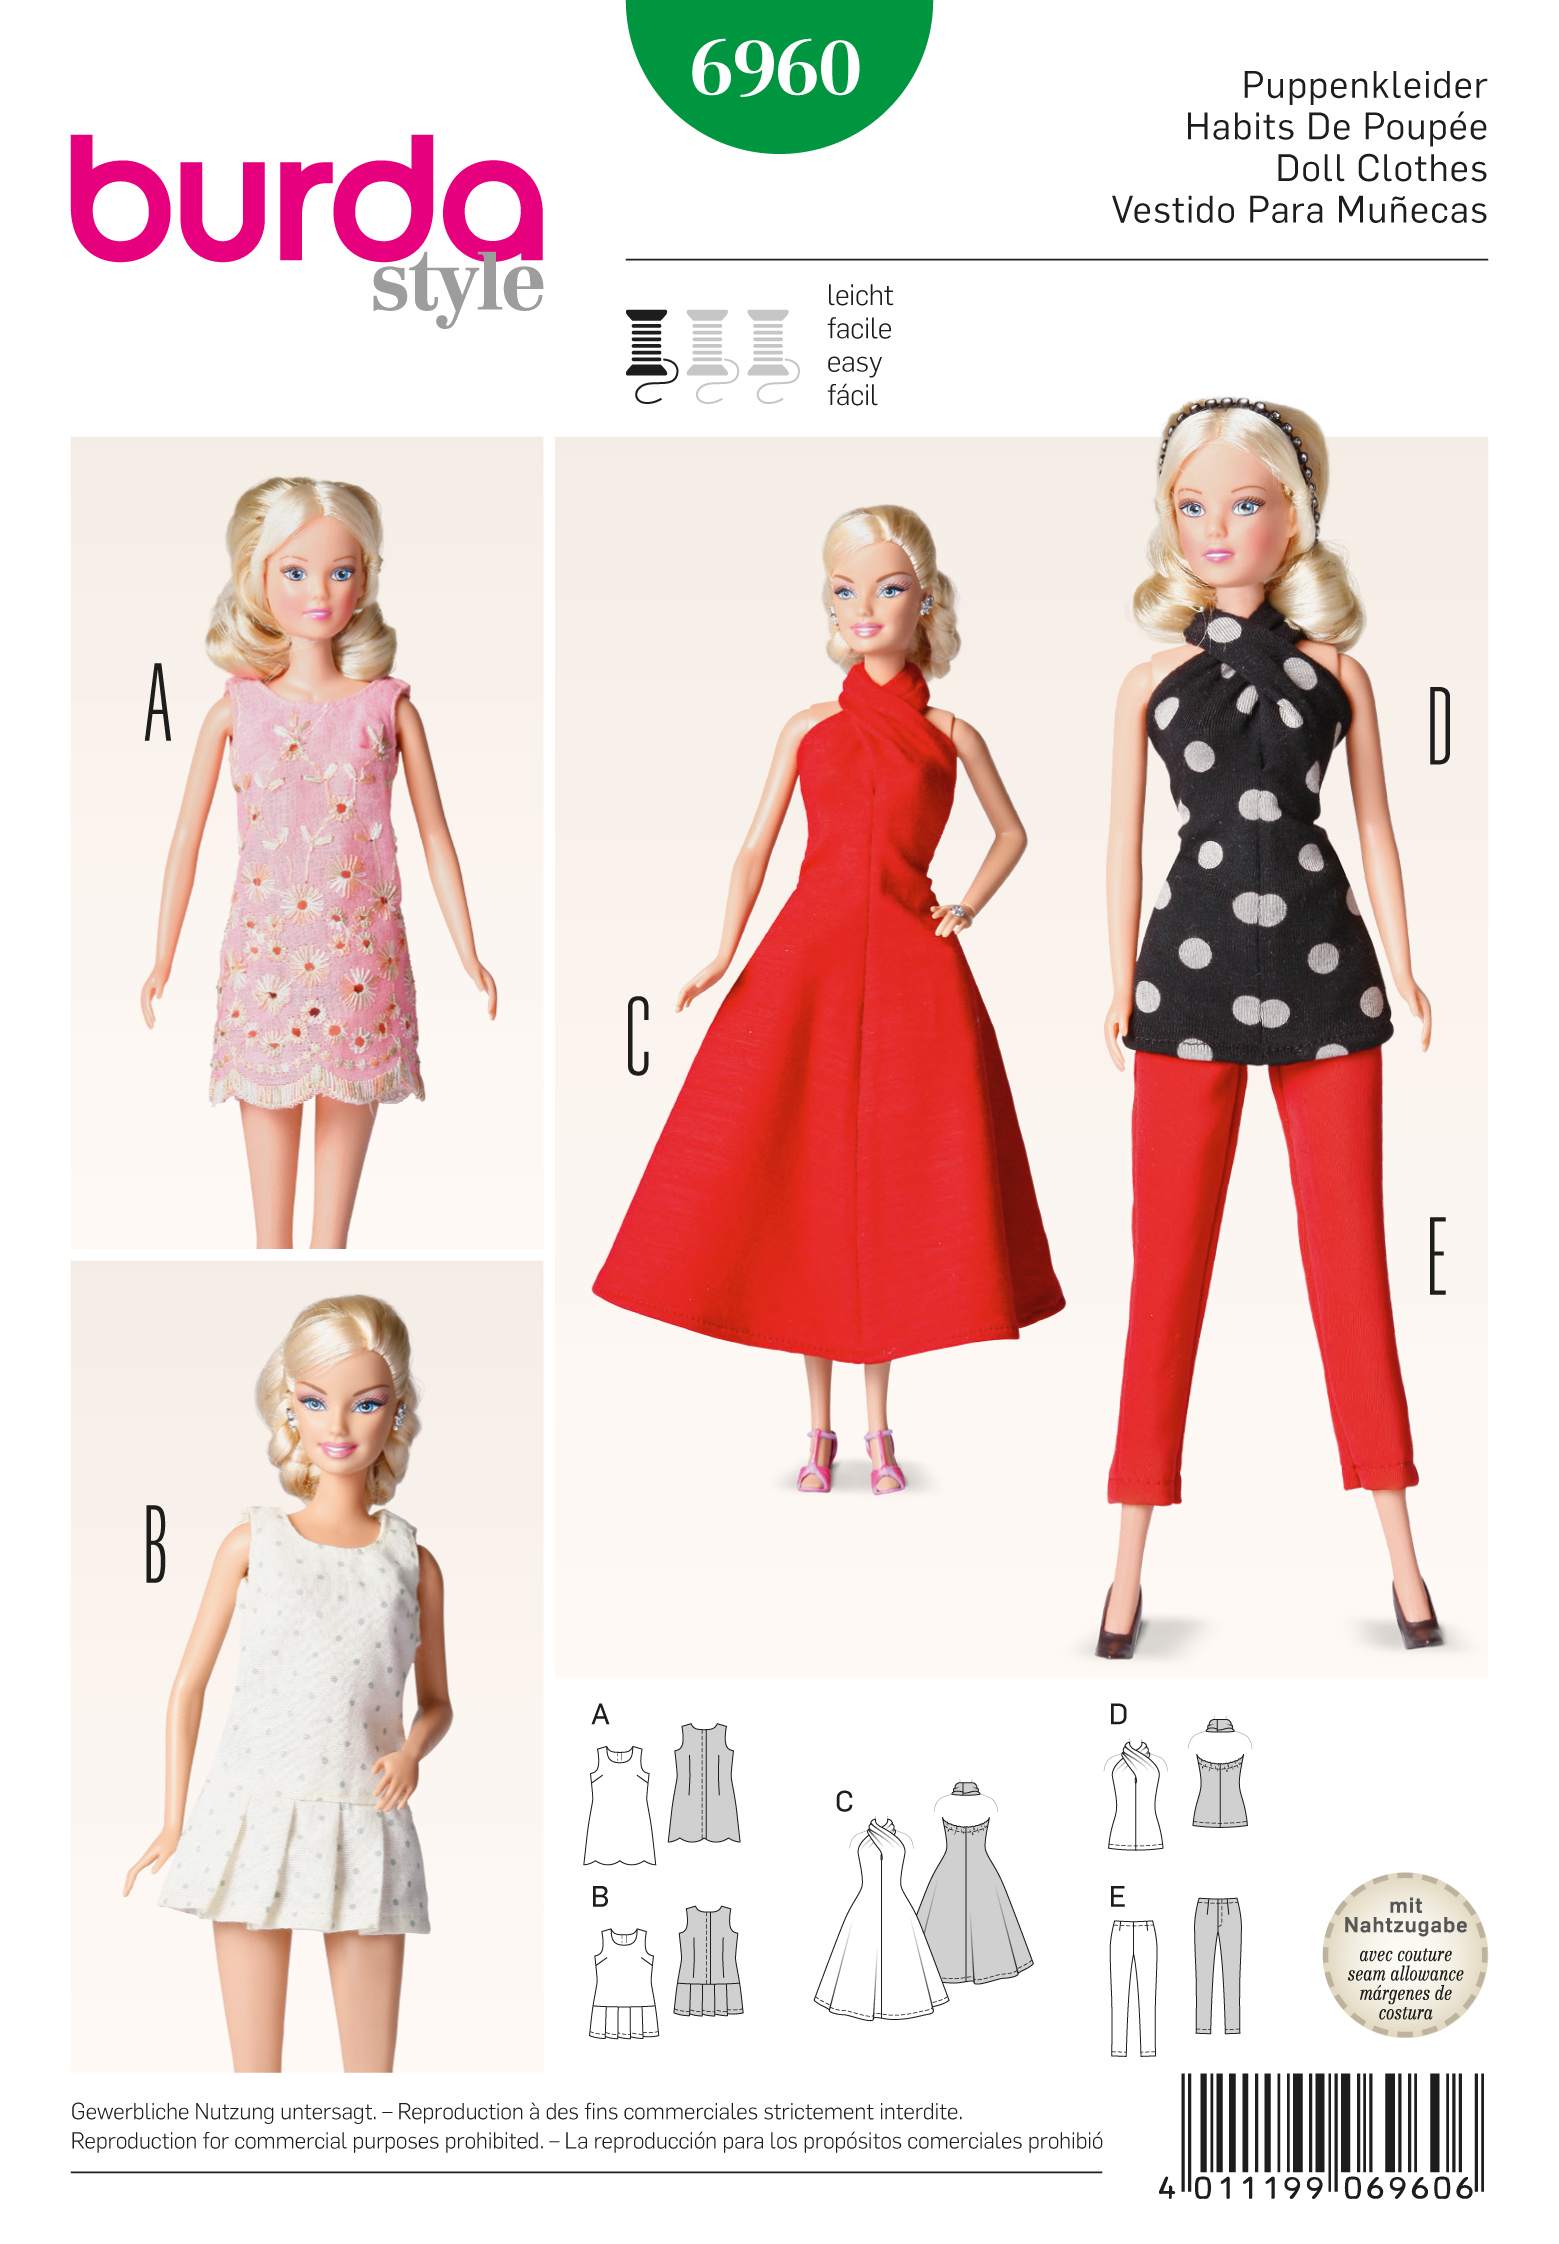 Burda Doll Clothes, Accessoires 6960